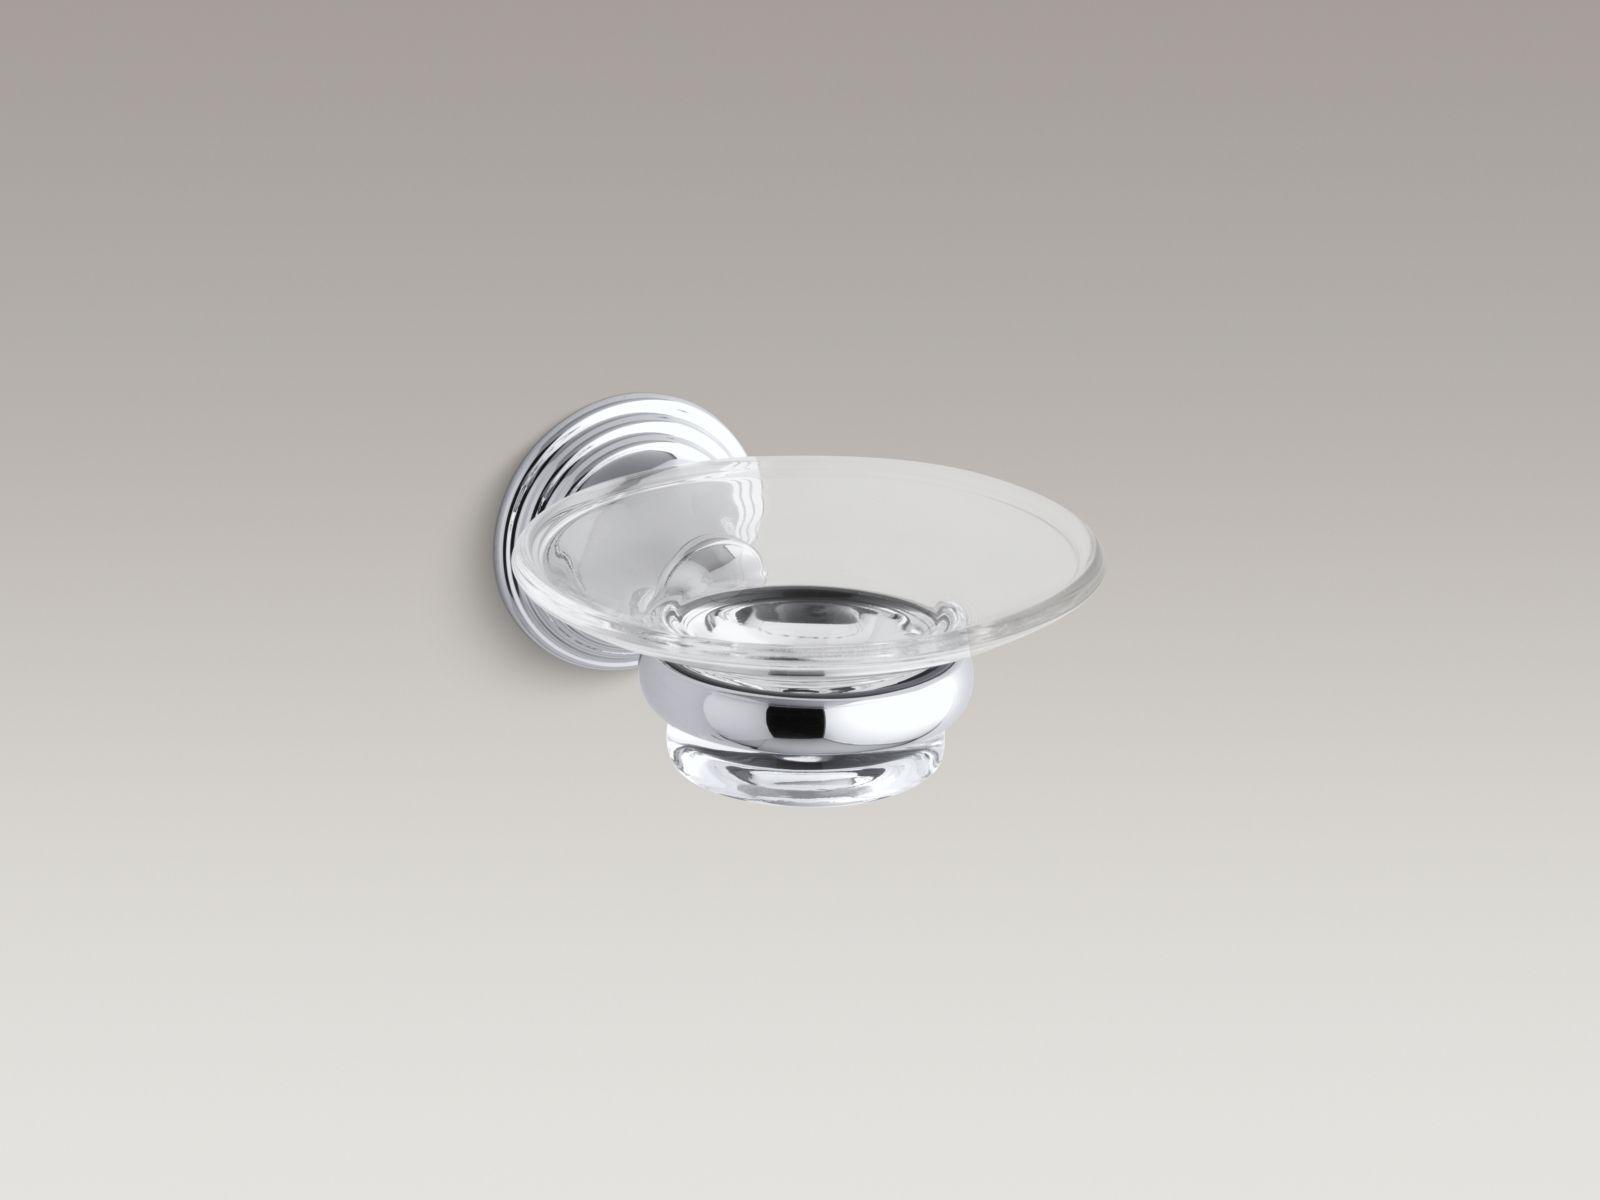 Kohler K-10560-CP Devonshire Wall-mounted Soap Dish Polished Chrome